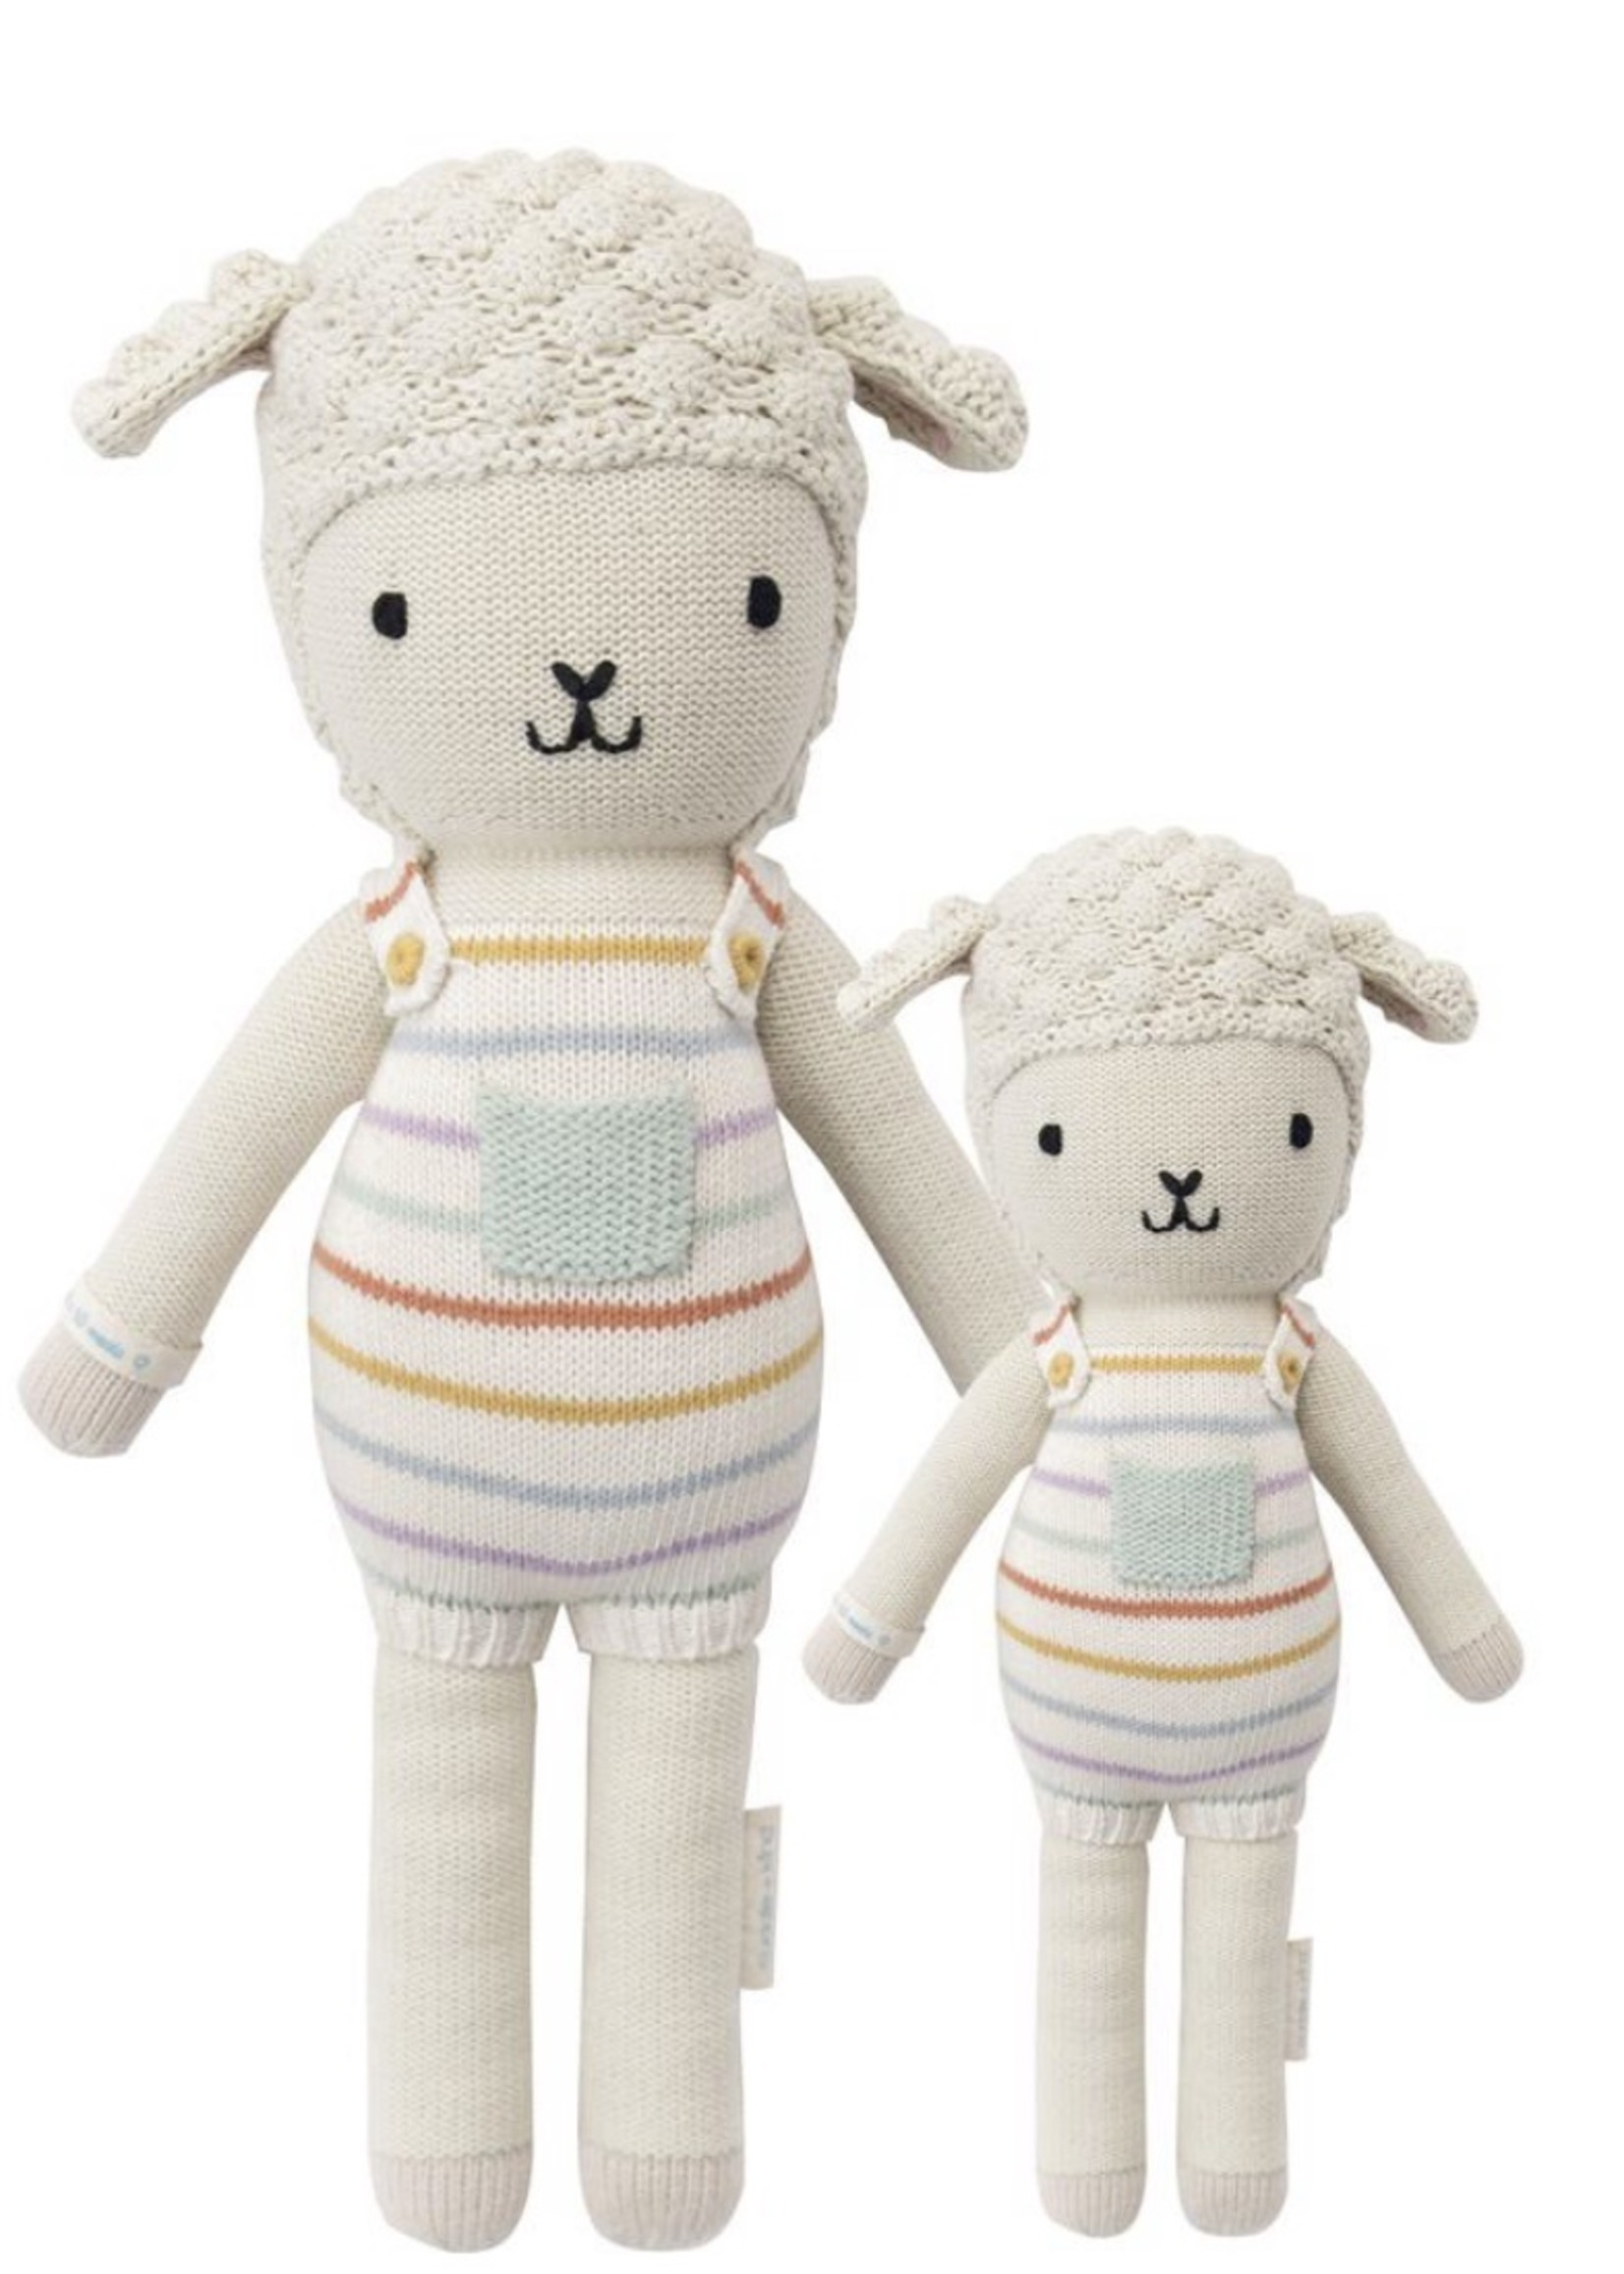 cuddle + kind Big Lamb Knit Doll AVERY